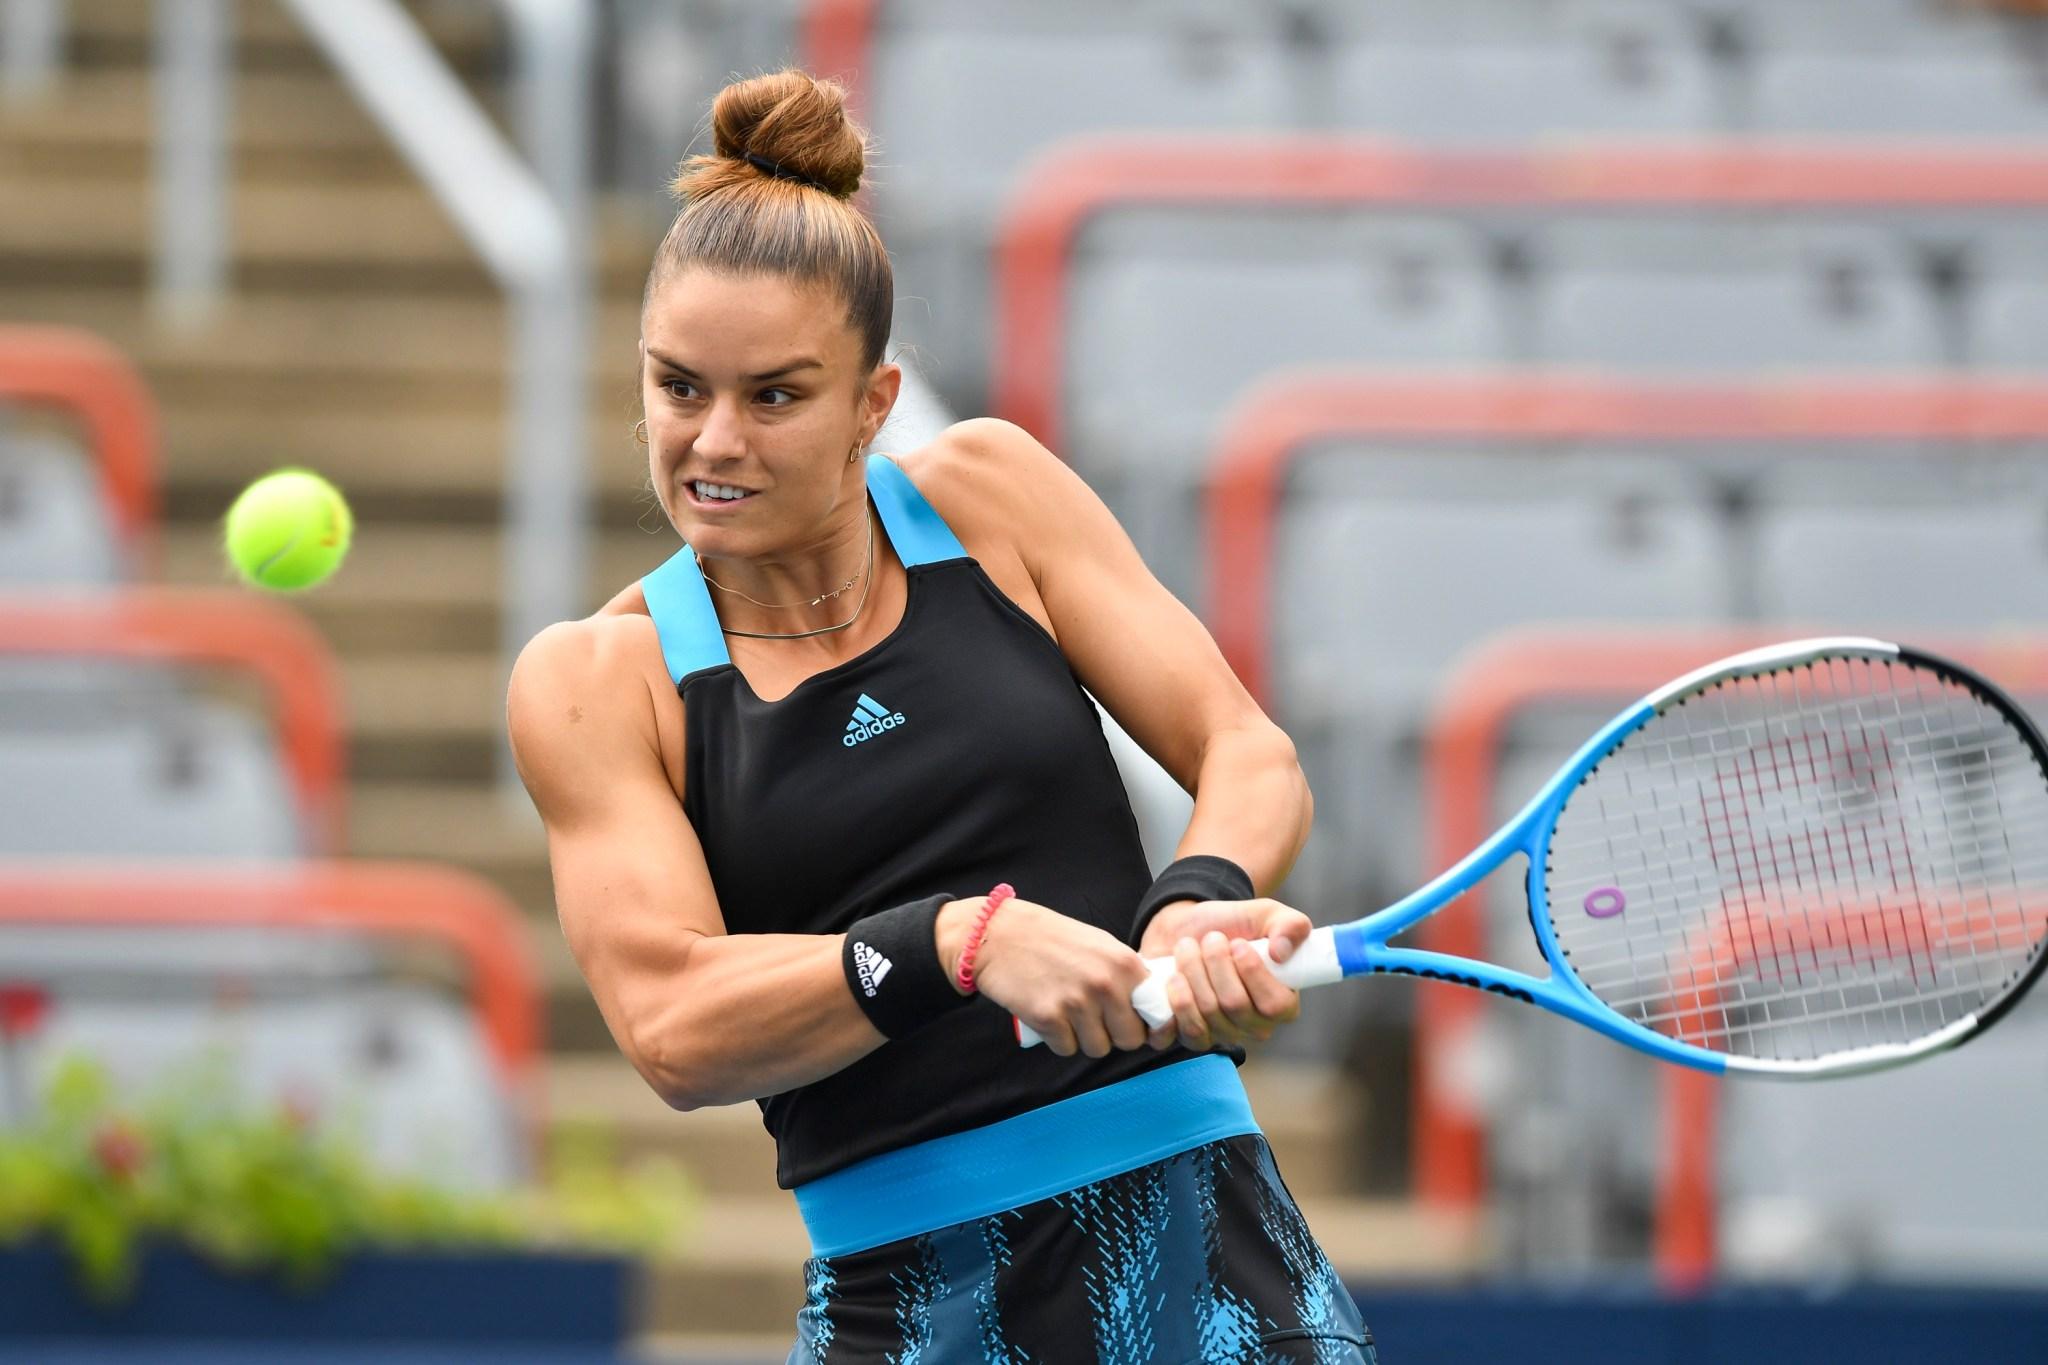 US Open 2021: Maria Sakkari vs. Katerina Siniakova Tennis Pick and Prediction